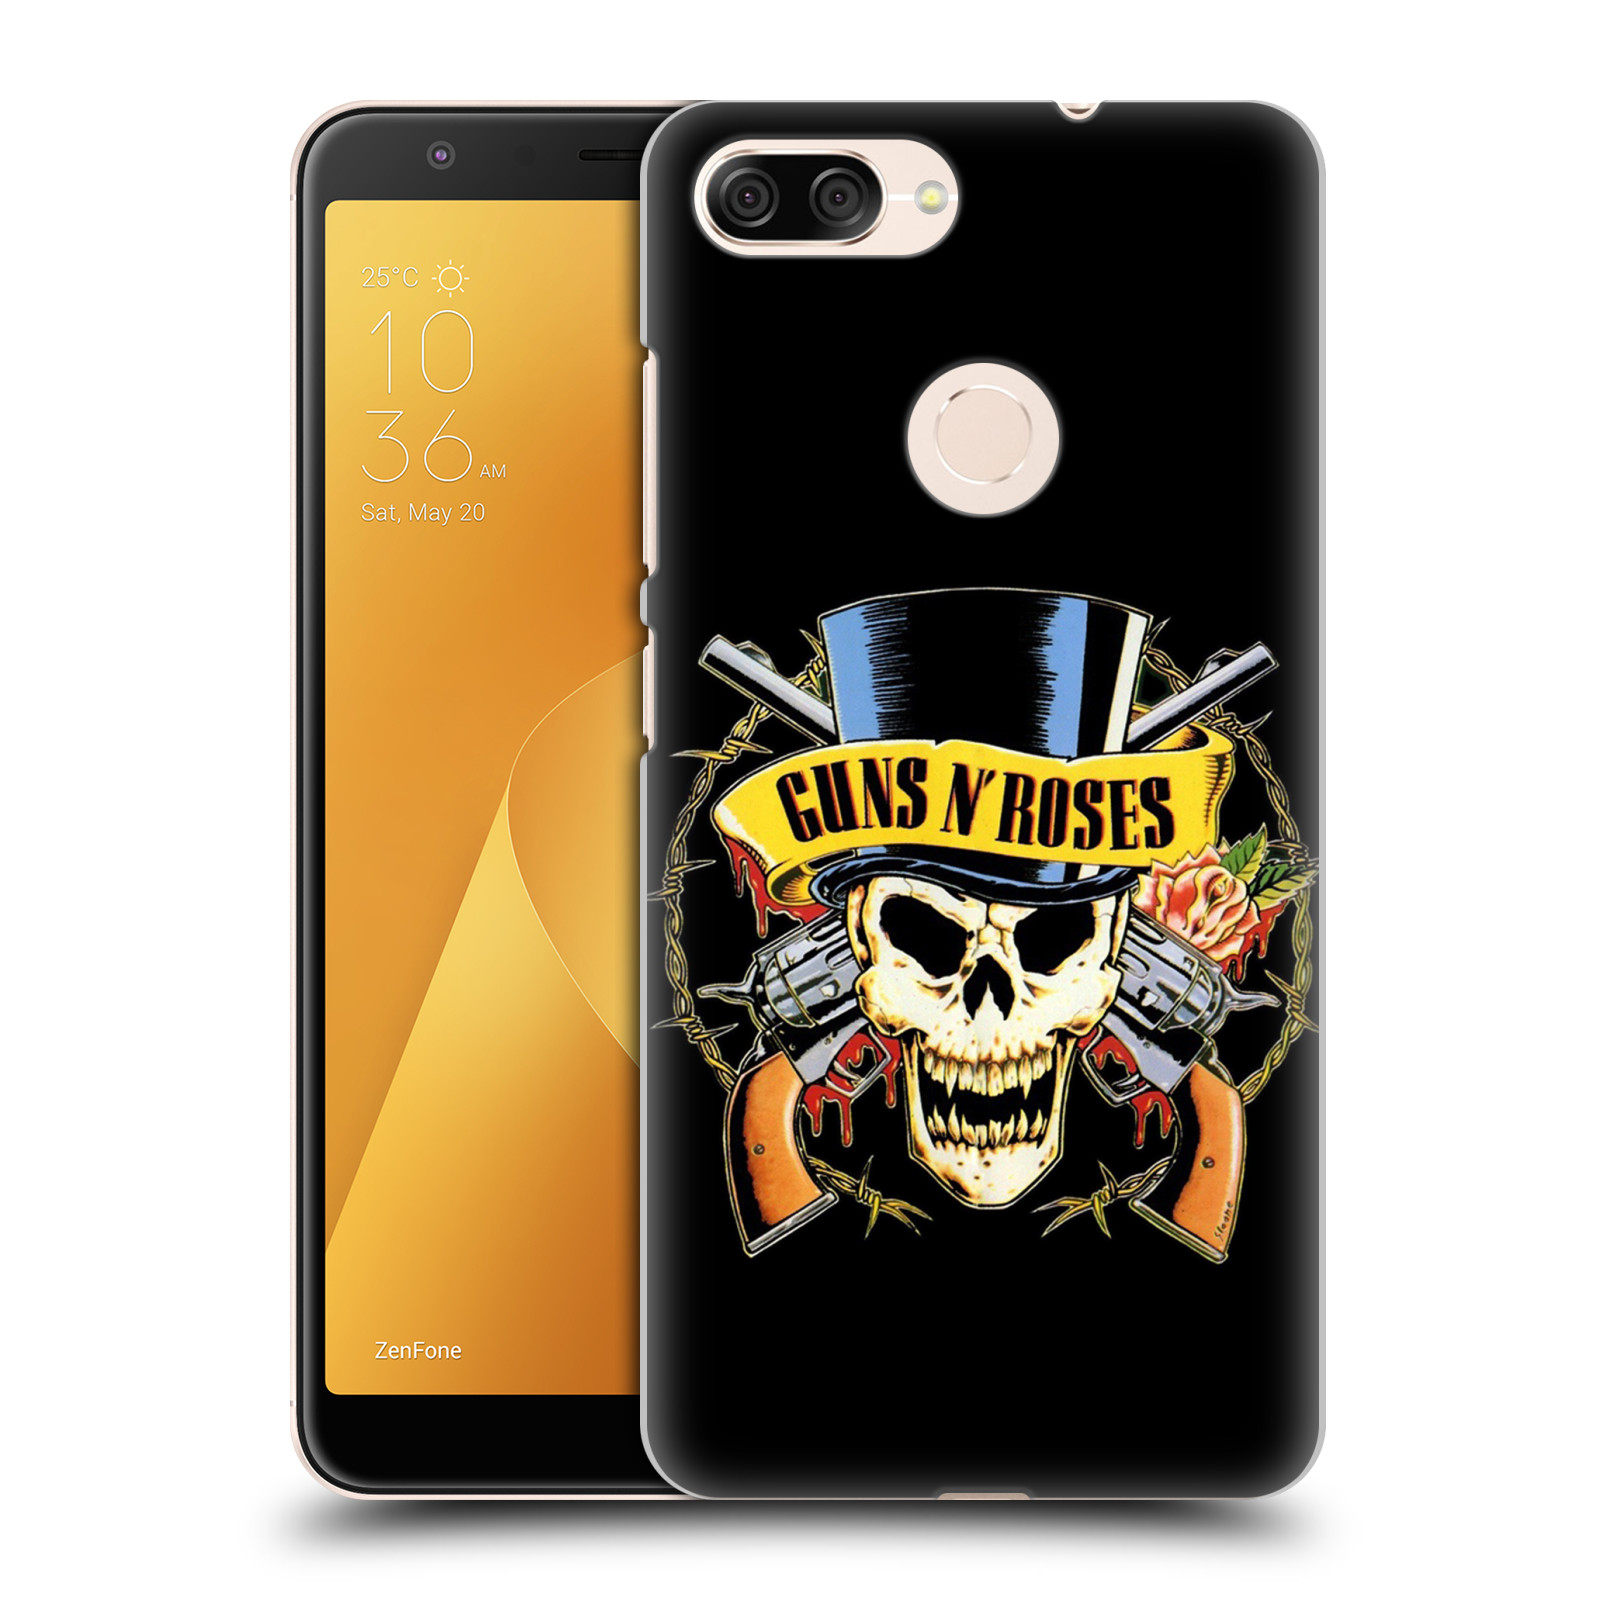 Plastové pouzdro na mobil Asus ZenFone Max Plus (M1) - Head Case - Guns N' Roses - Lebka